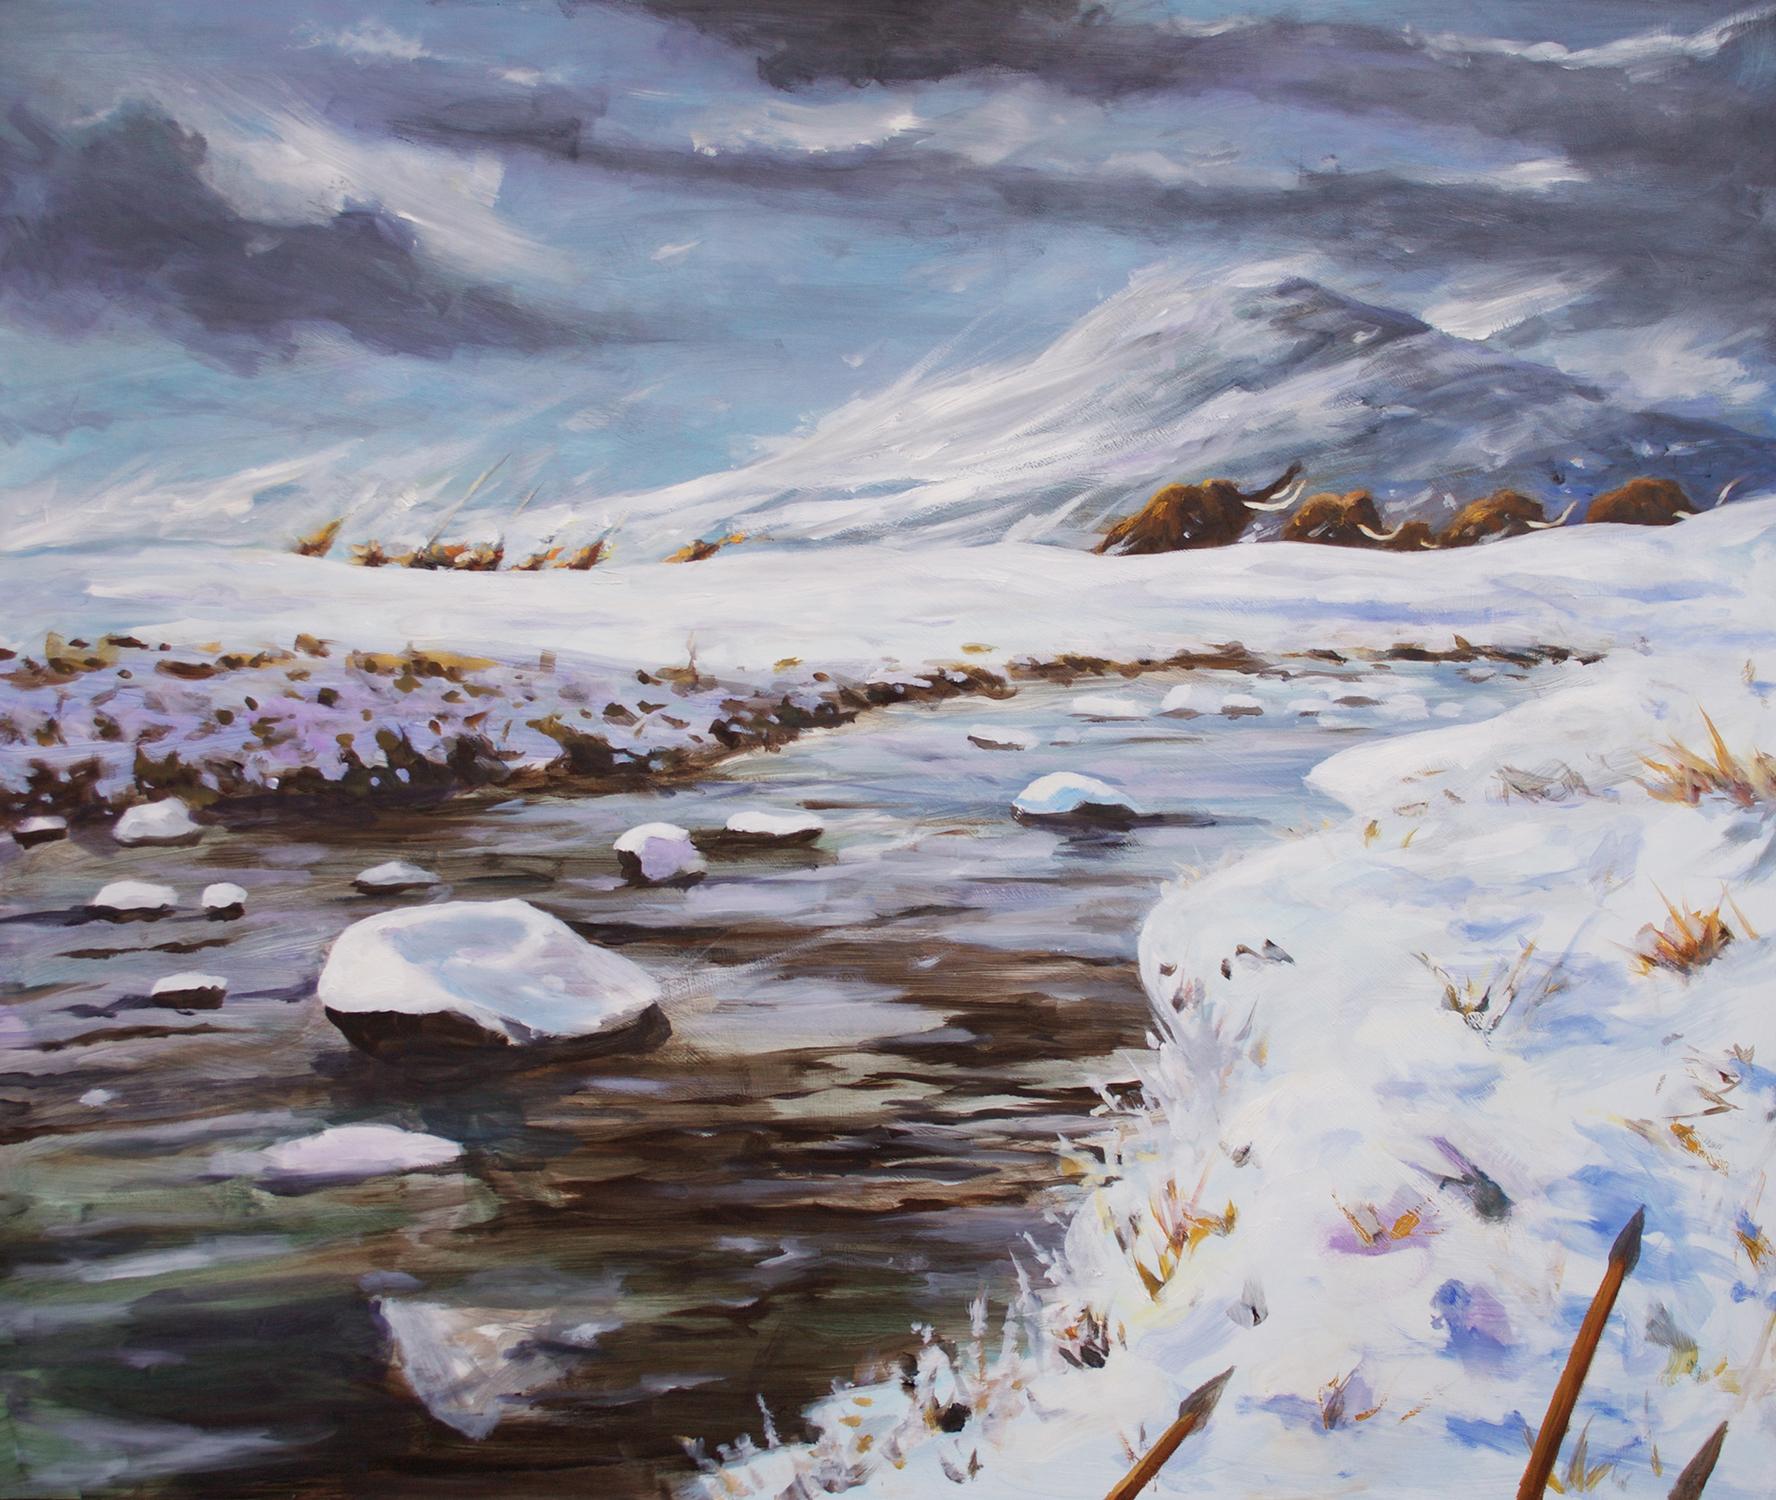 The Mammoth Hunt Artwork by Brian McElligott